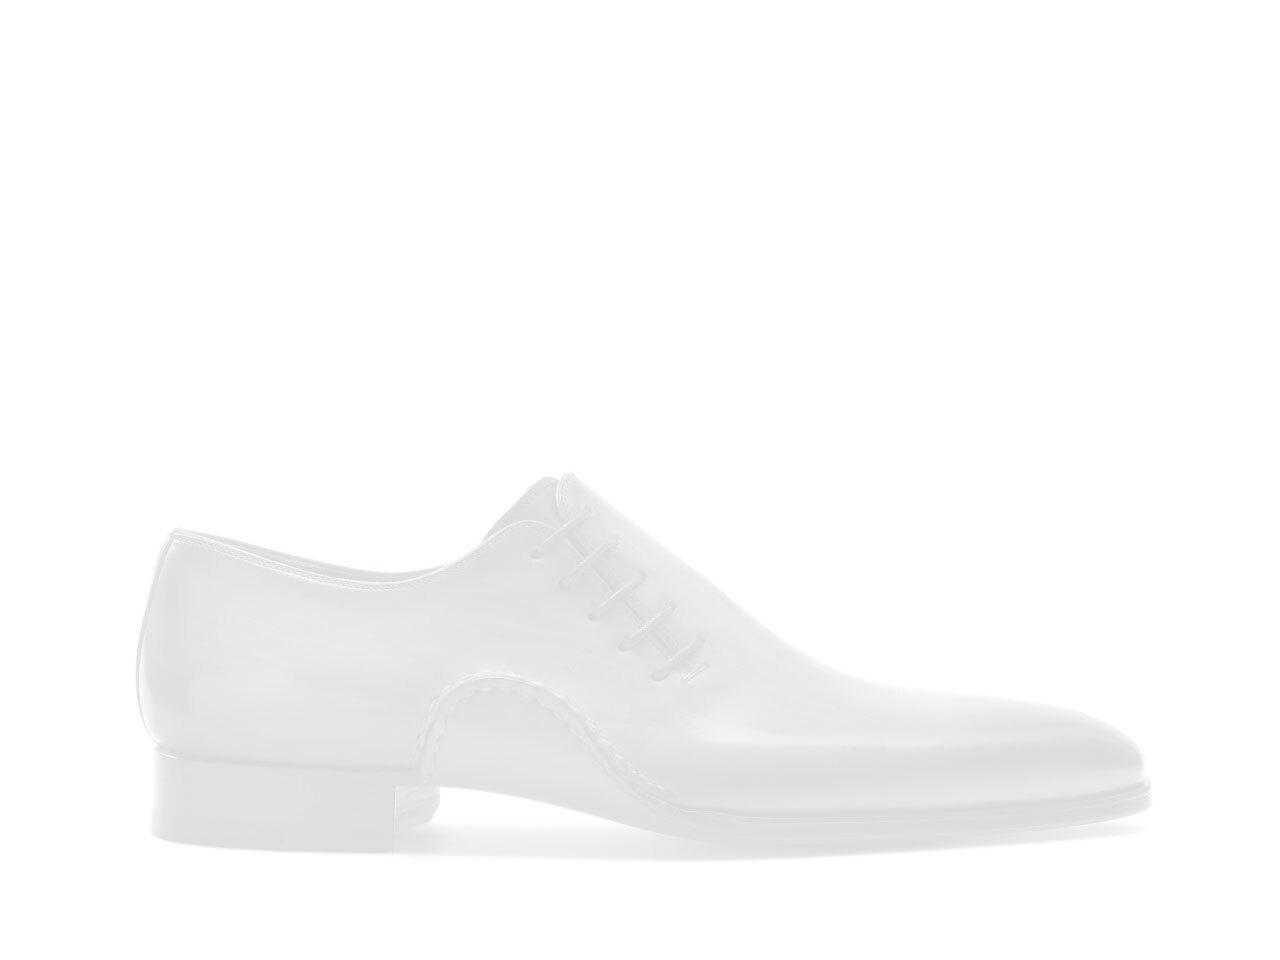 Light brown suede brogue double monk strap shoes for men - Magnanni